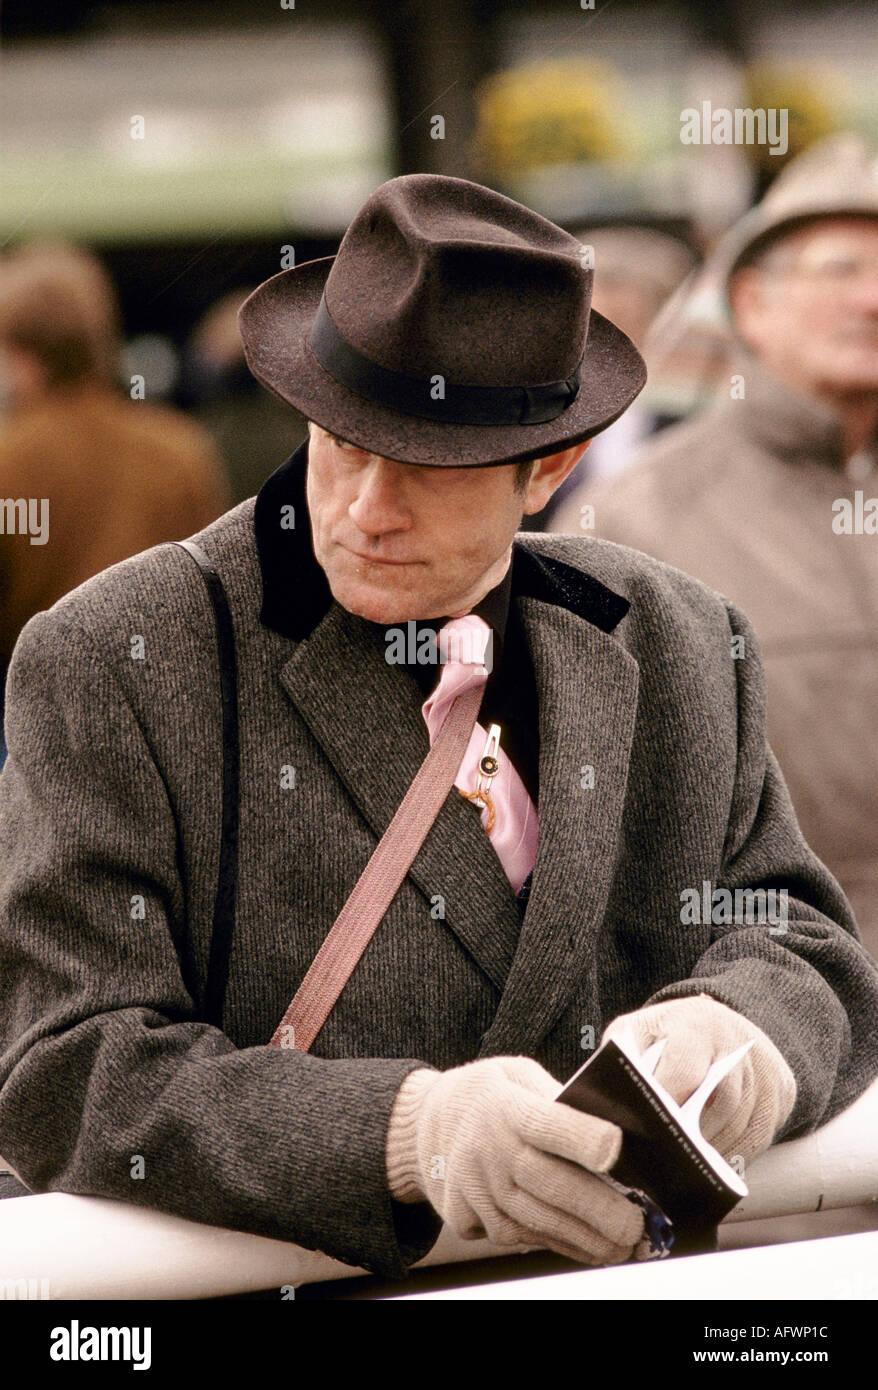 Brown Fedora Hat For Men